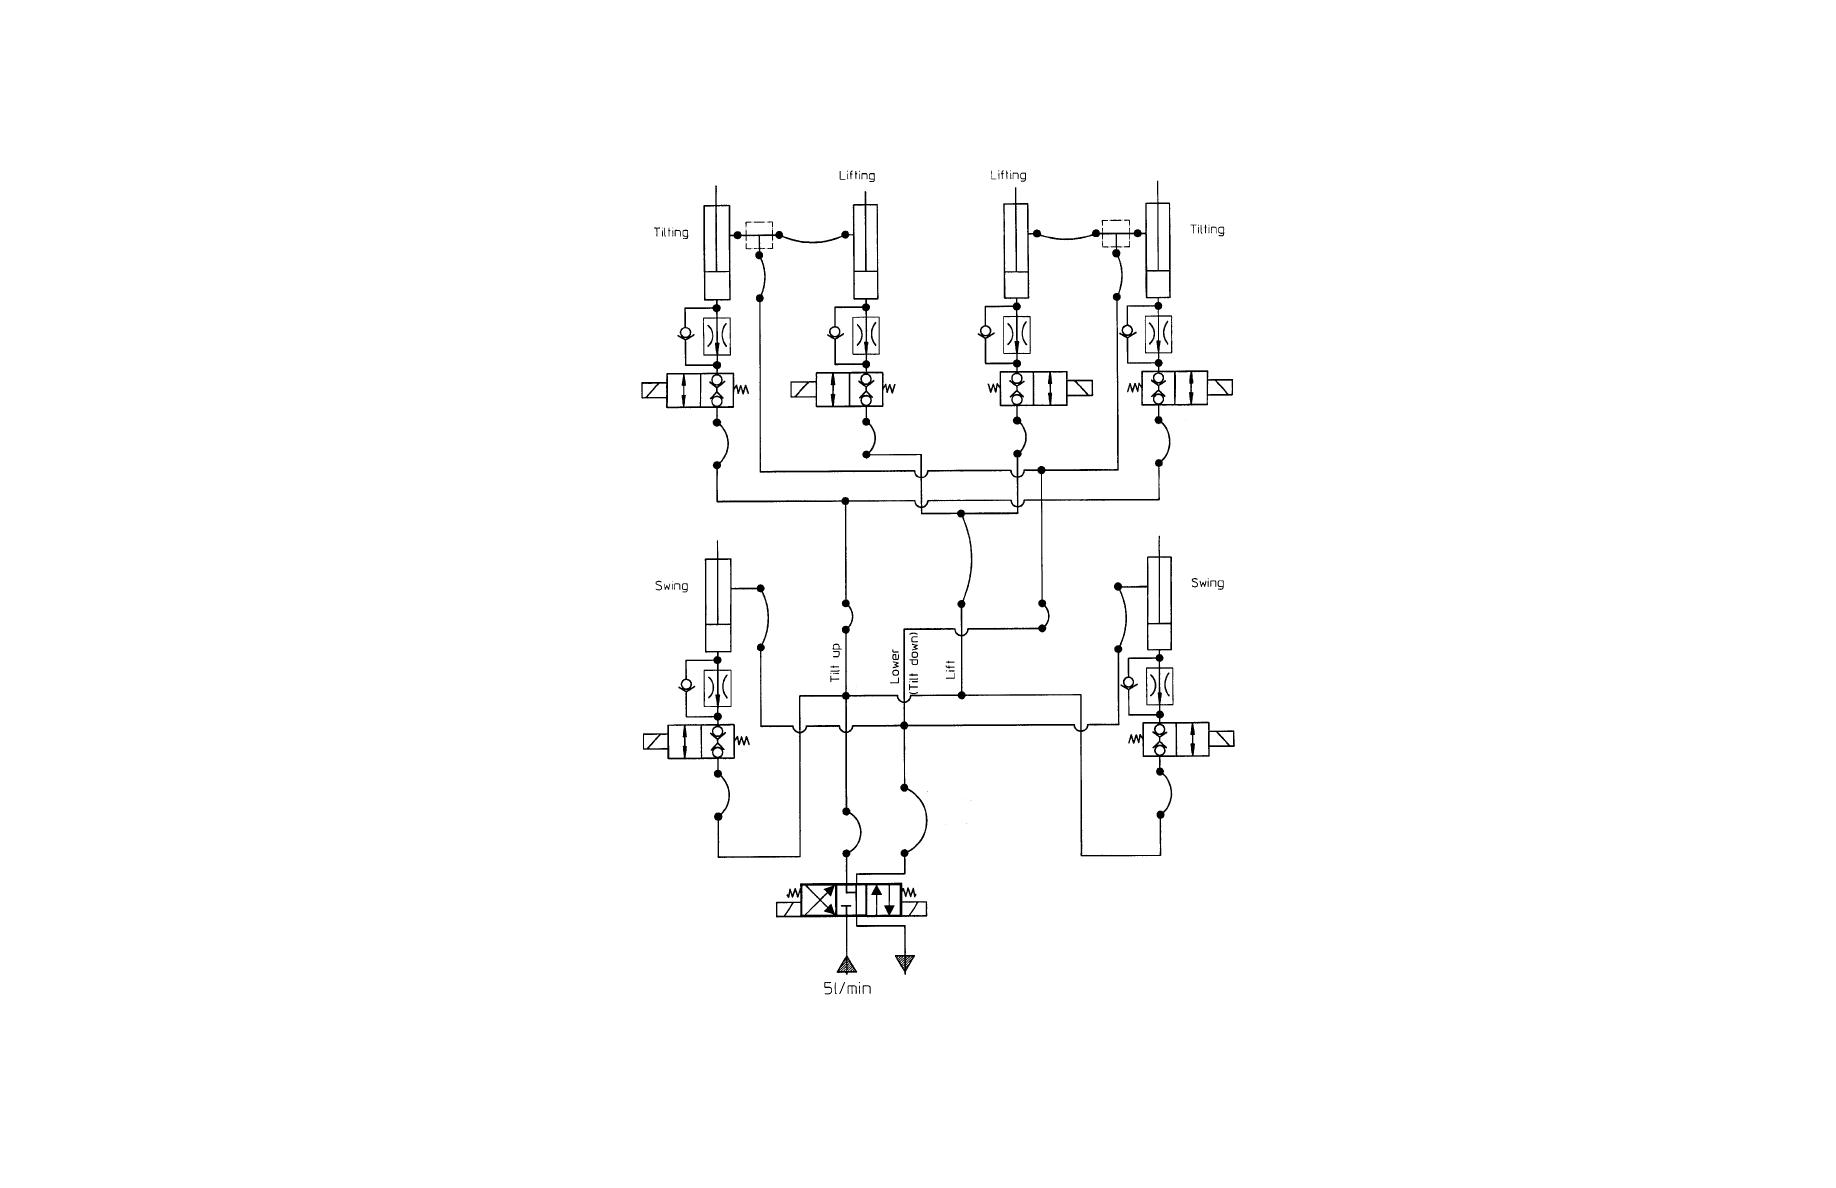 tuck away heater wiring diagram